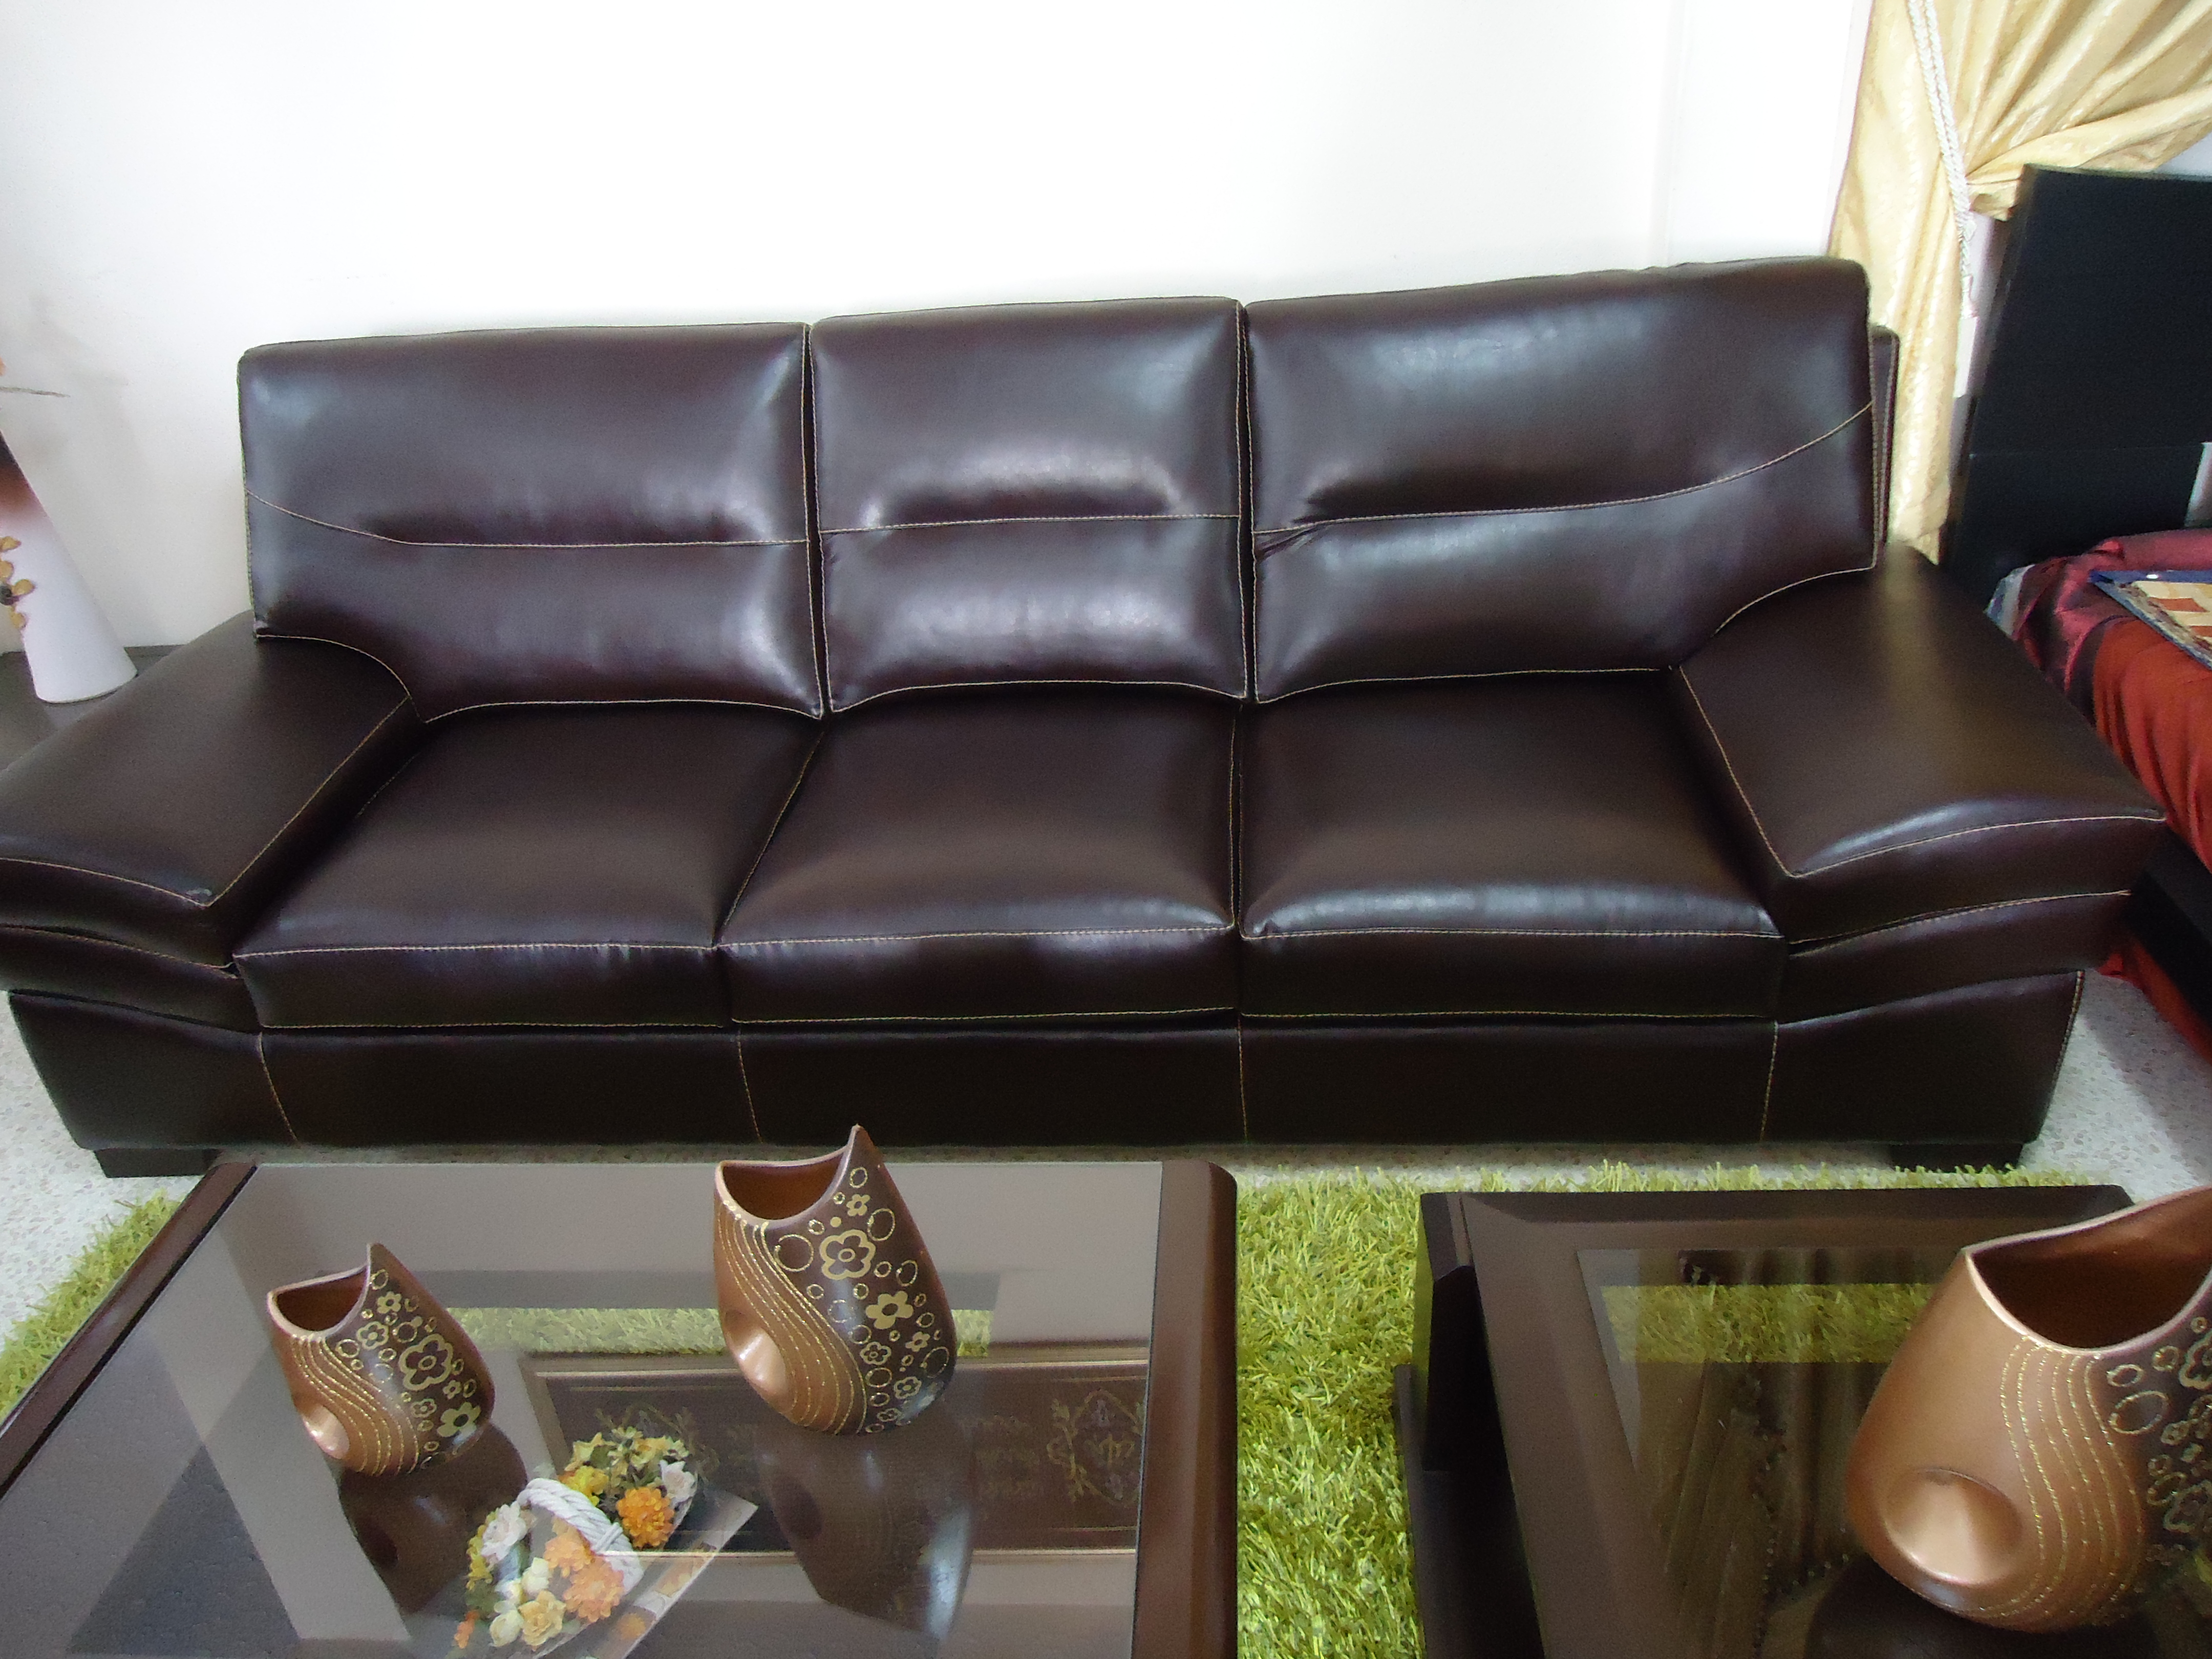 salon simili cuir tunisie images. Black Bedroom Furniture Sets. Home Design Ideas